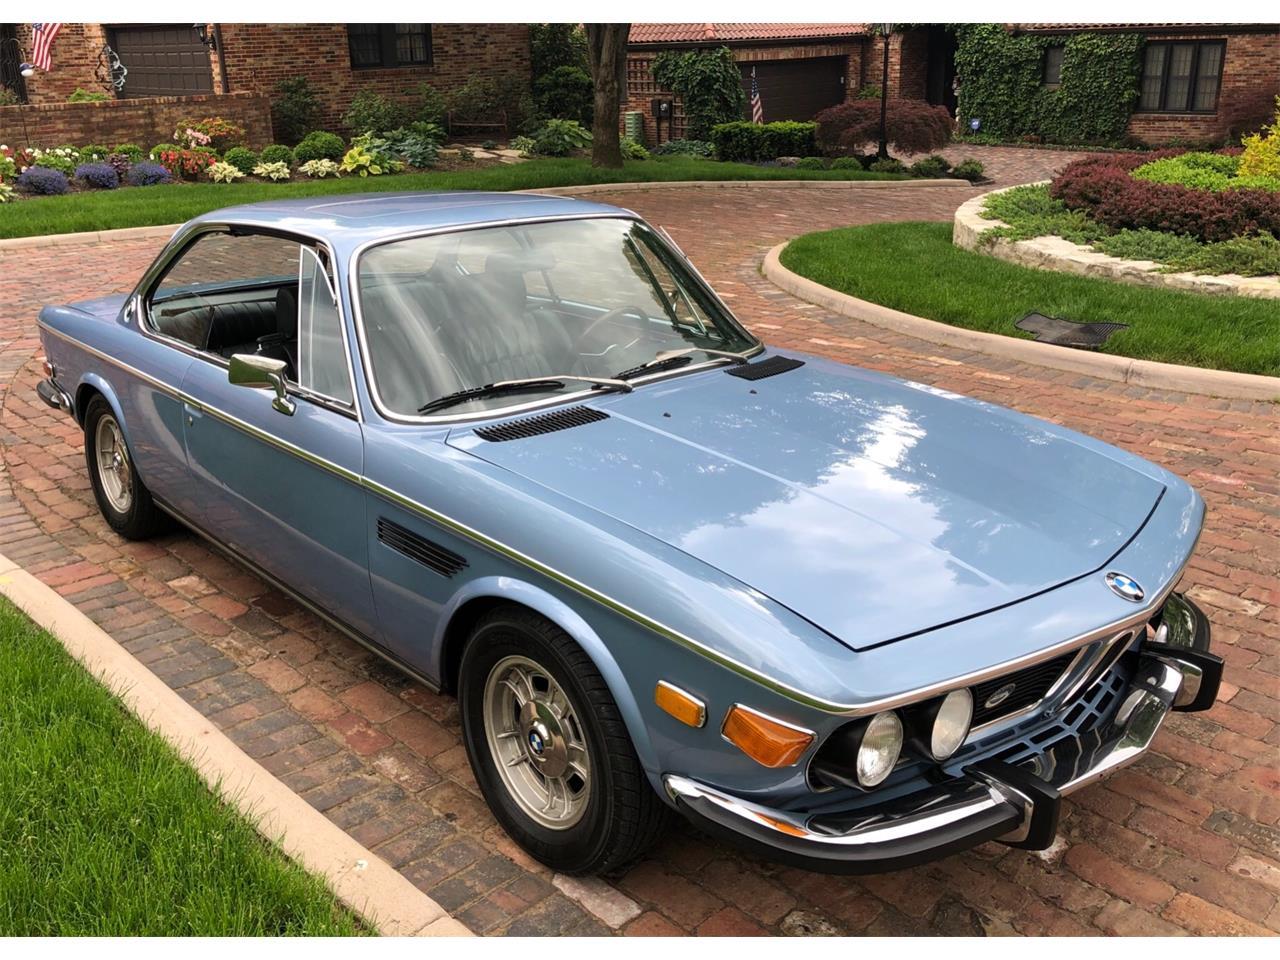 Bmw Columbus Ohio >> 1972 Bmw 3 Series For Sale Classiccars Com Cc 1225819